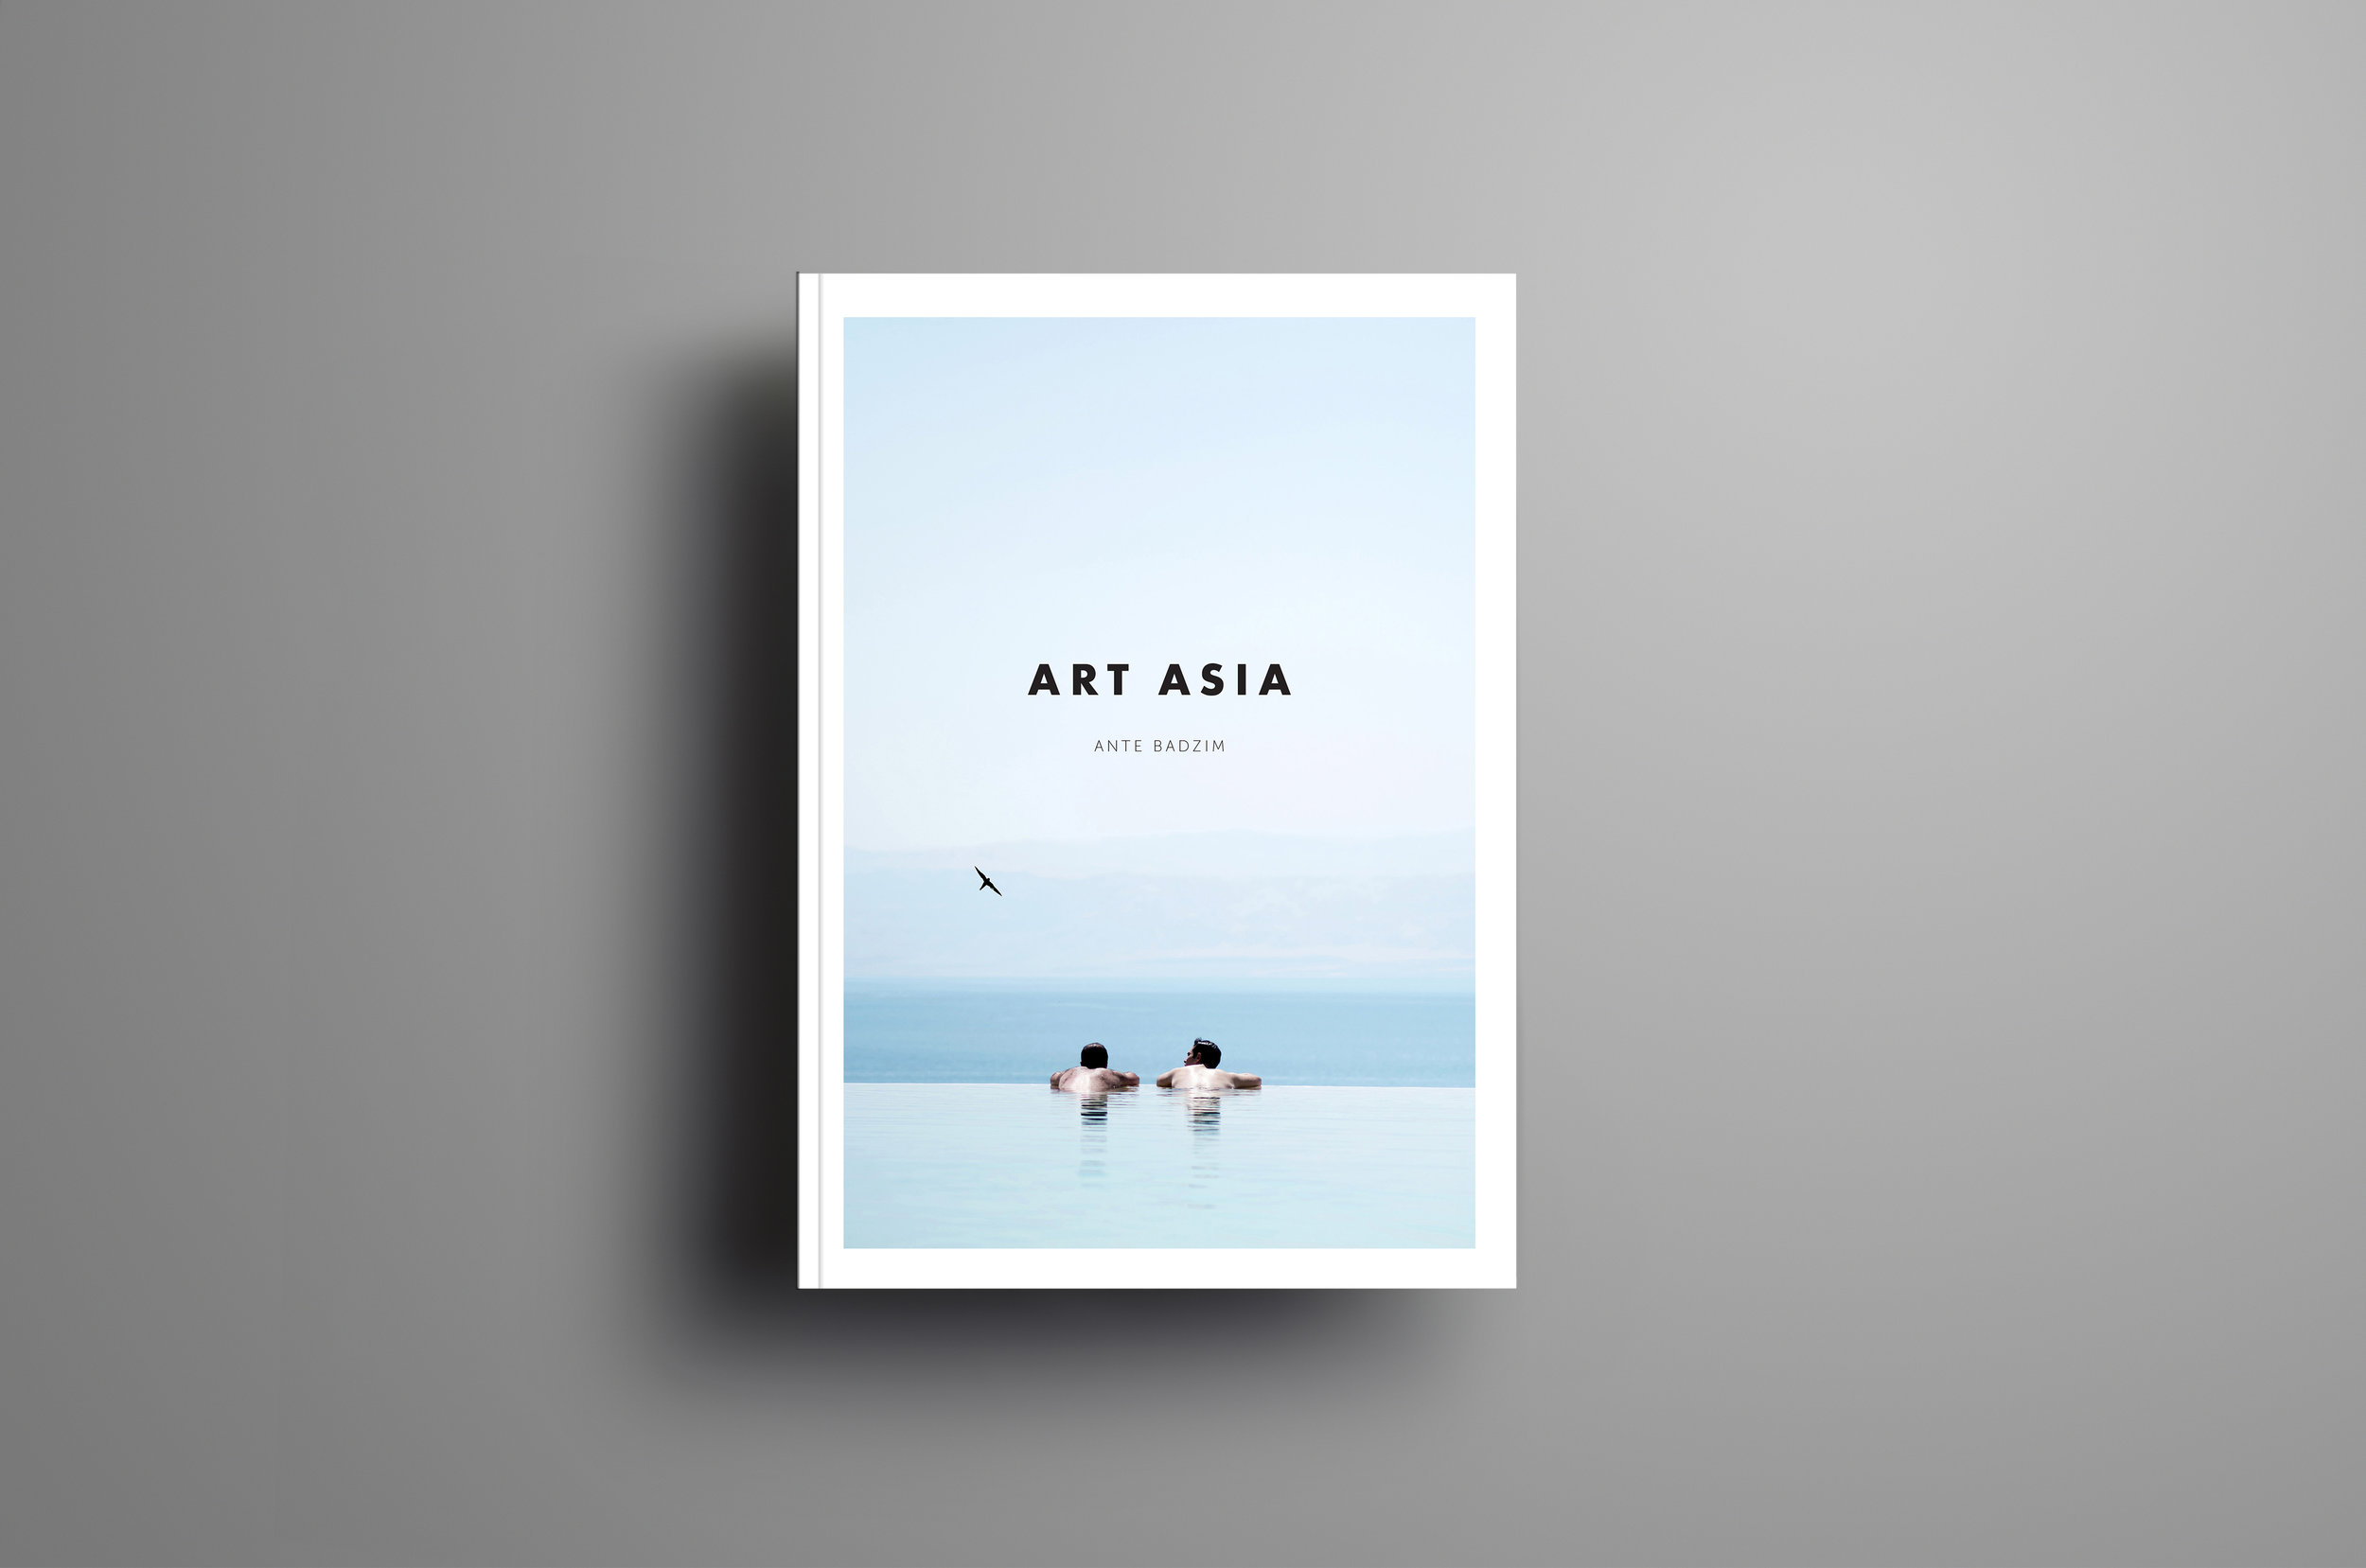 Art Asia Ante Badzim A5.jpg